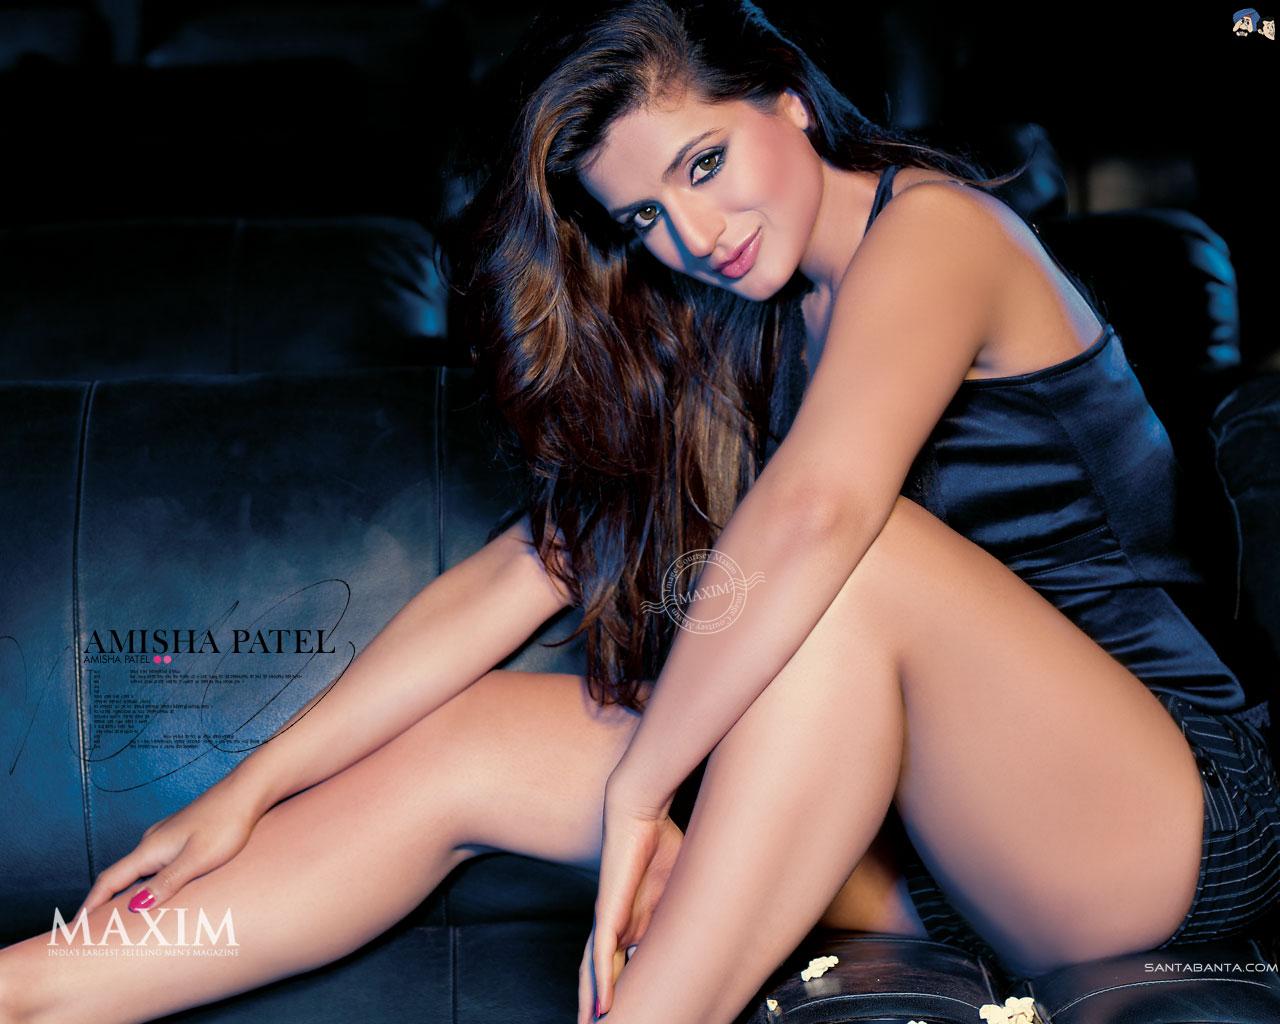 girl-amisa-ratal-full-sexe-images